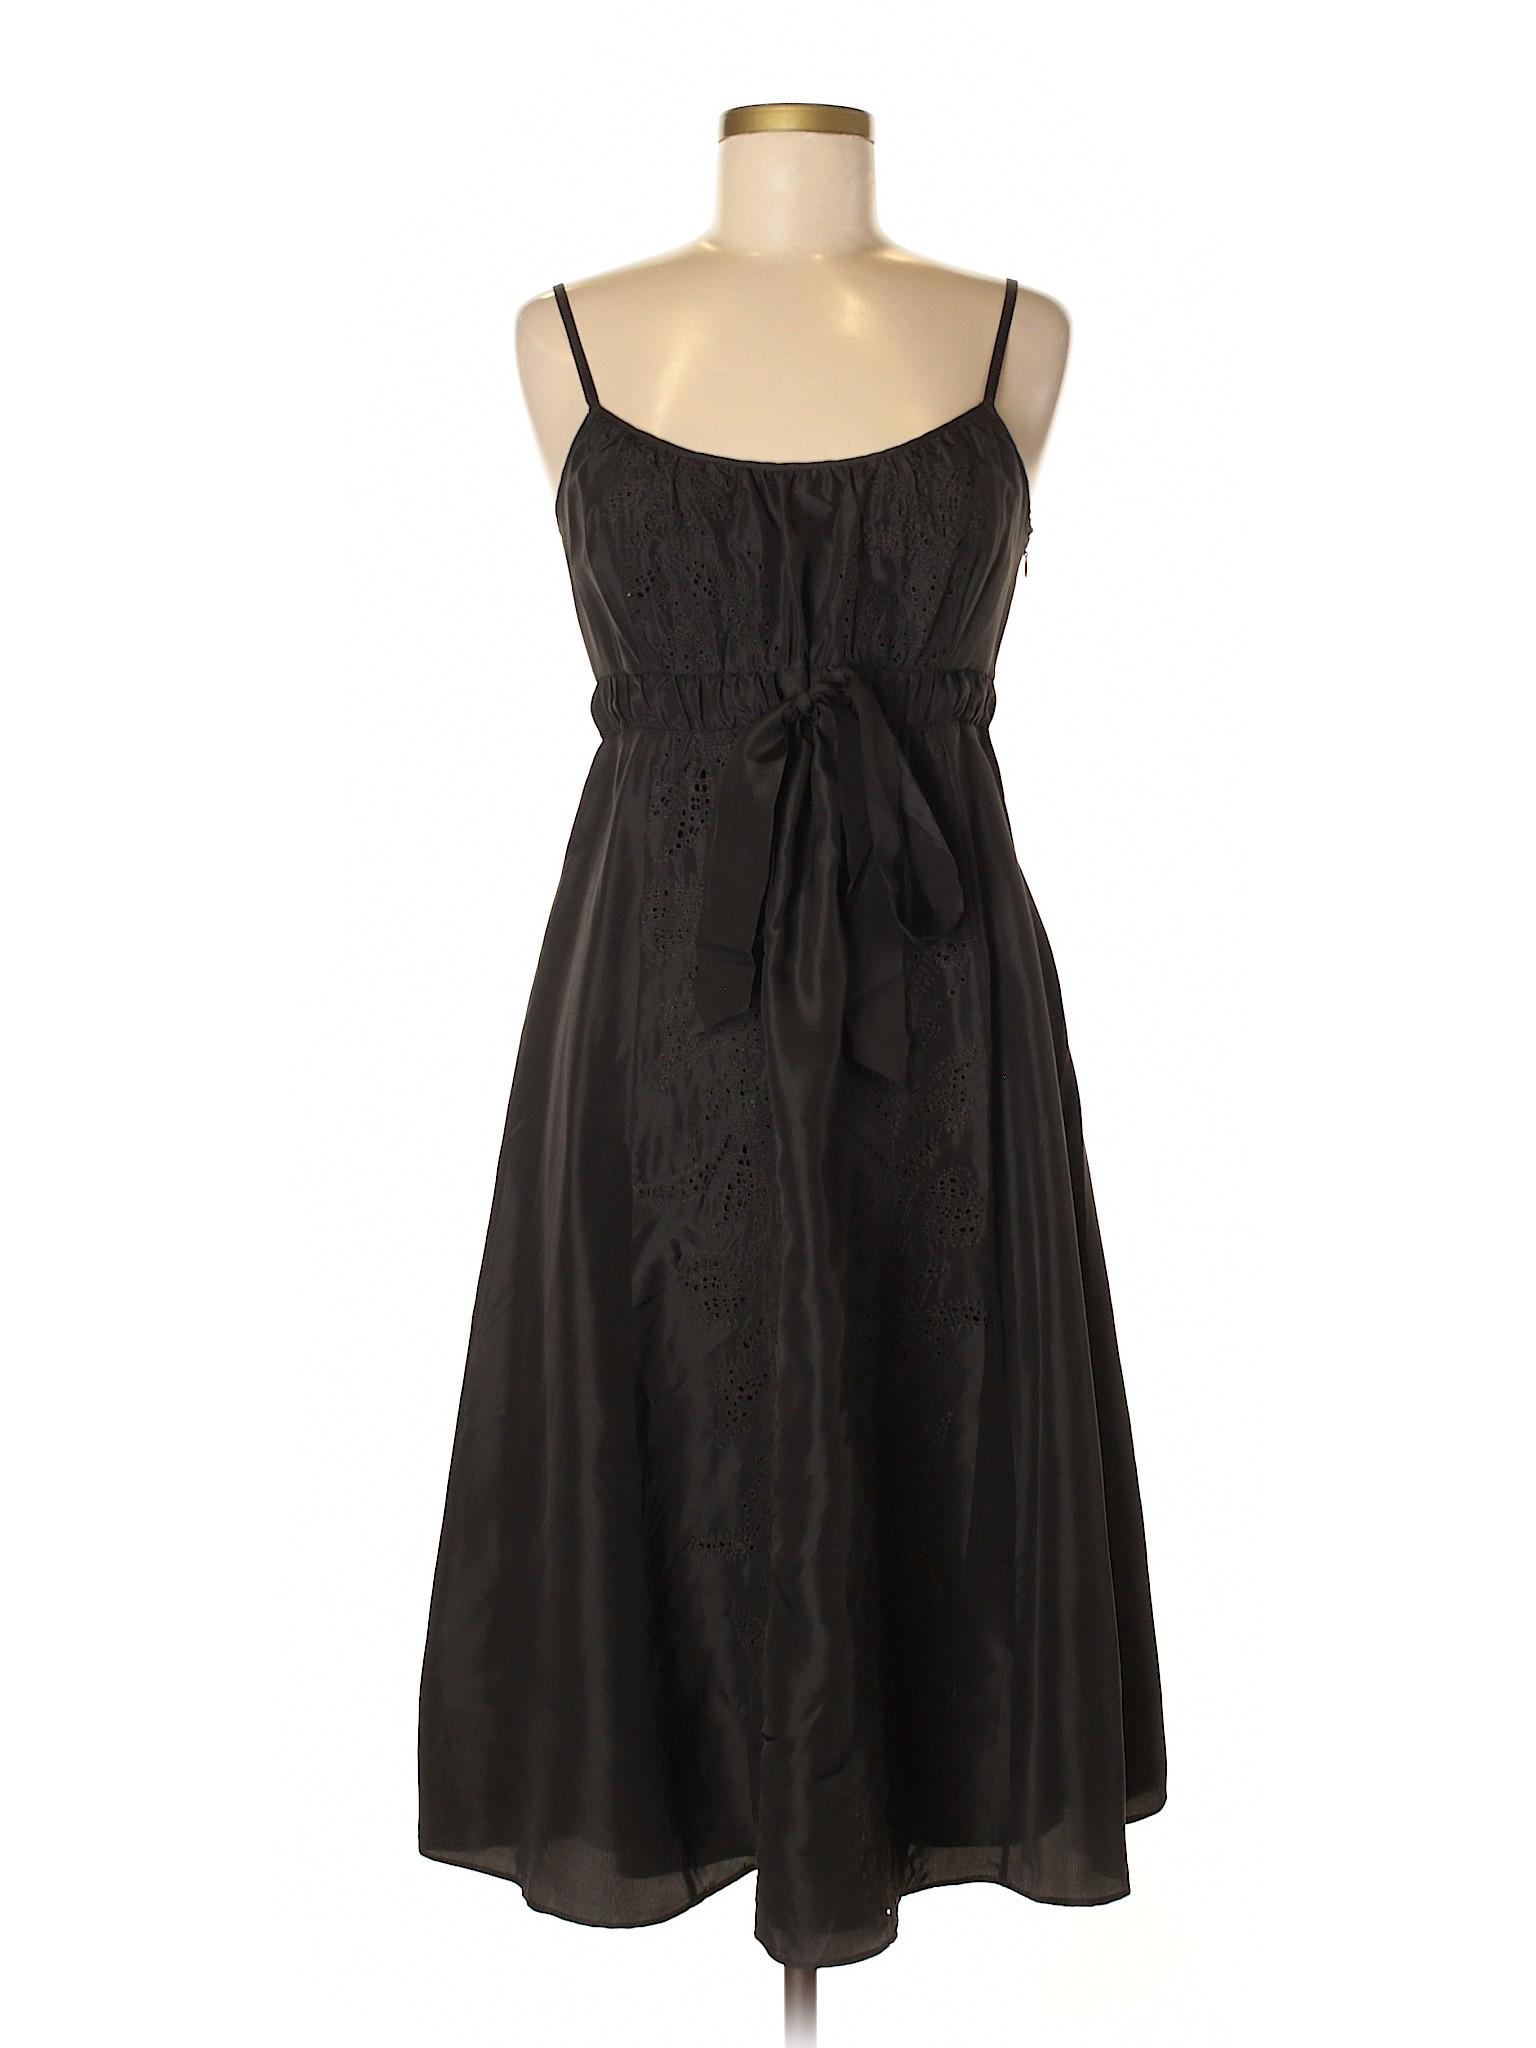 Republic Dress Boutique Casual winter Banana vpwfPT